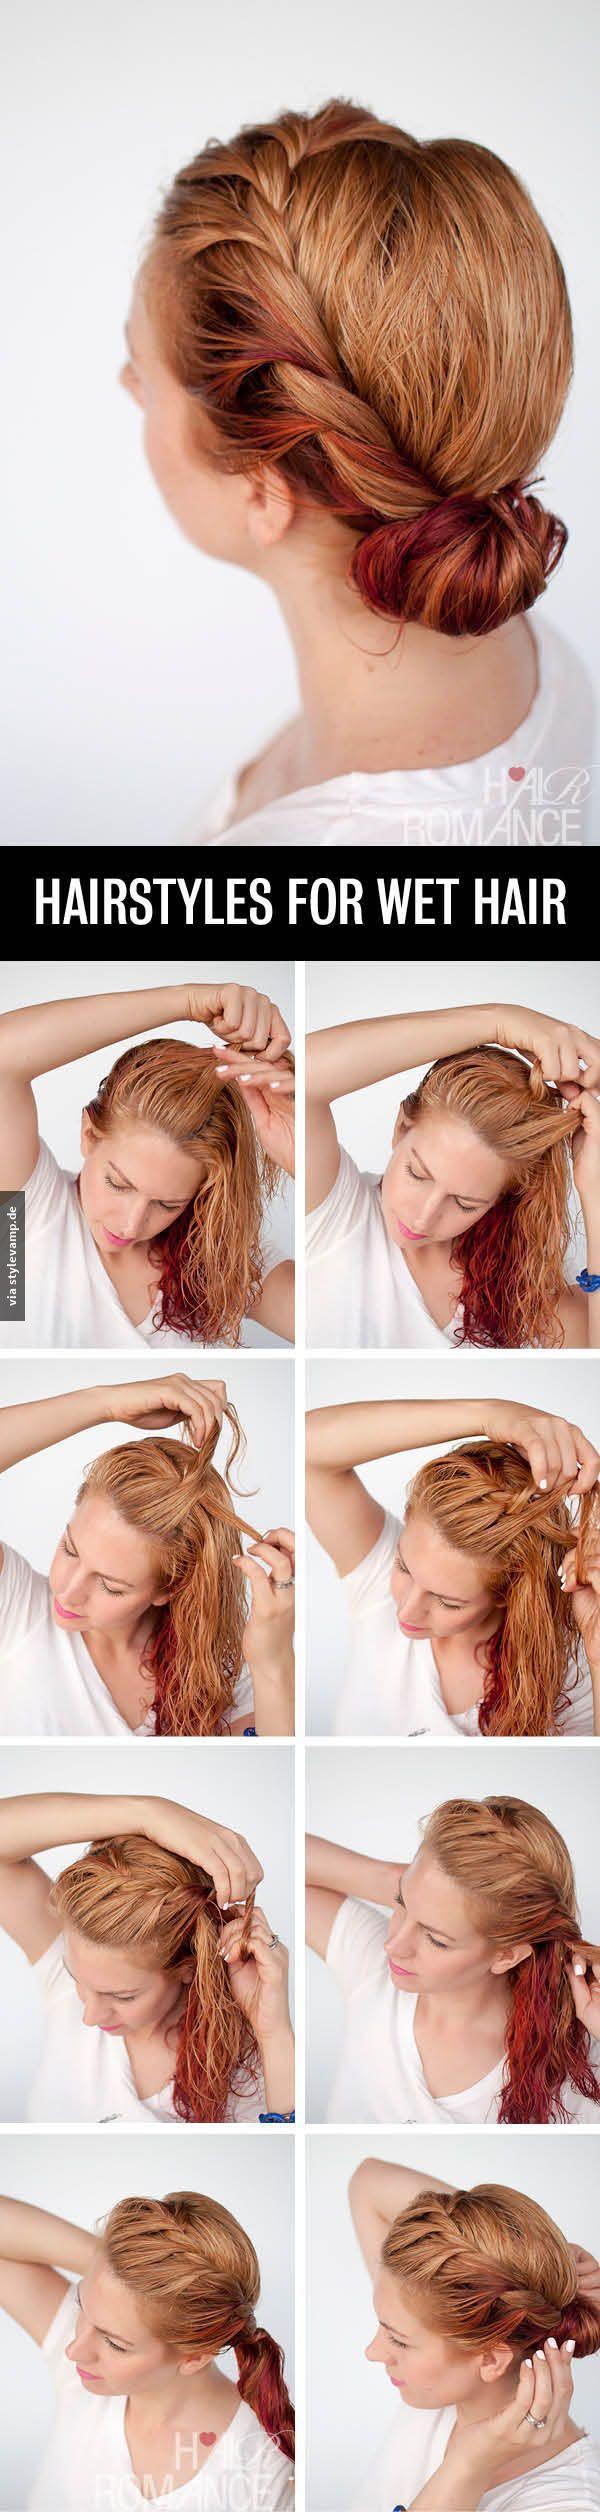 Frisur Fur Nasse Haare Hair Makeup In 2019 Frisuren Anleitung